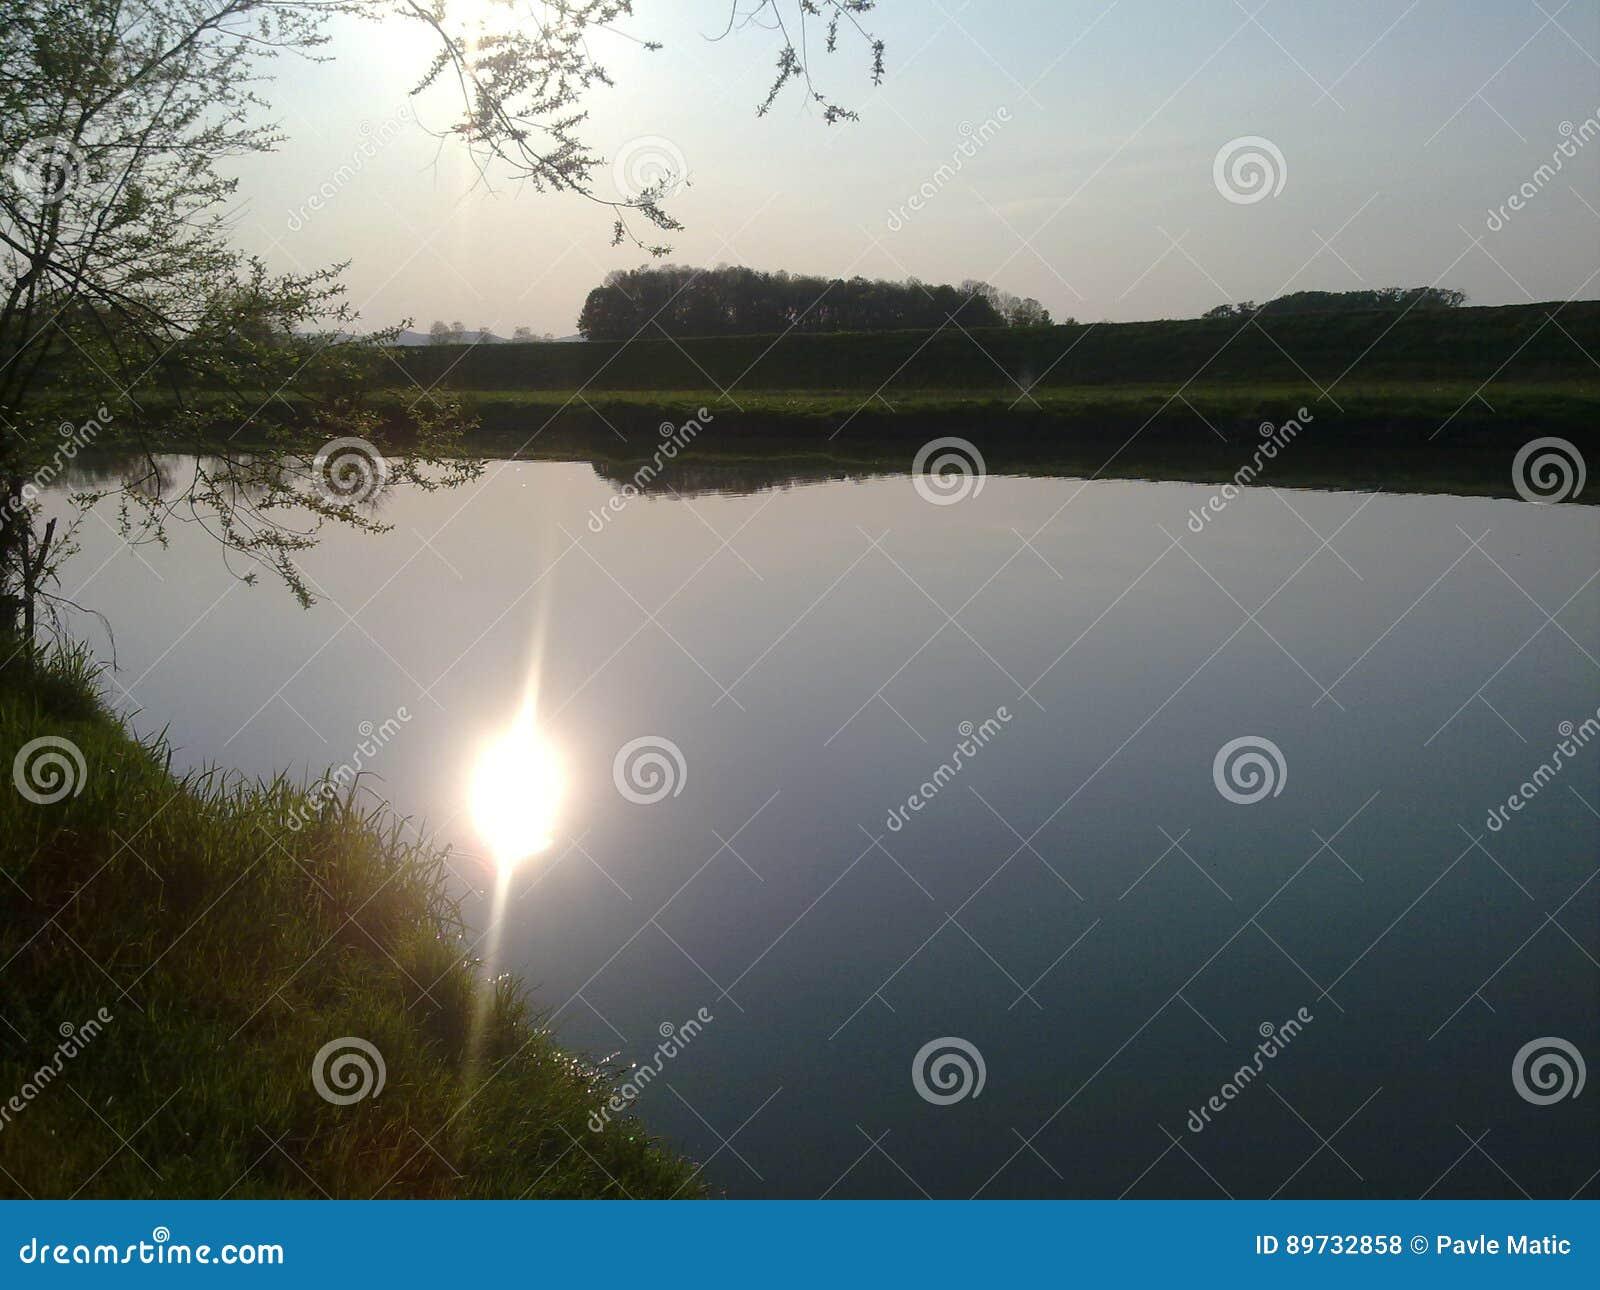 Nature. water, river, coast, sunset, kolubara